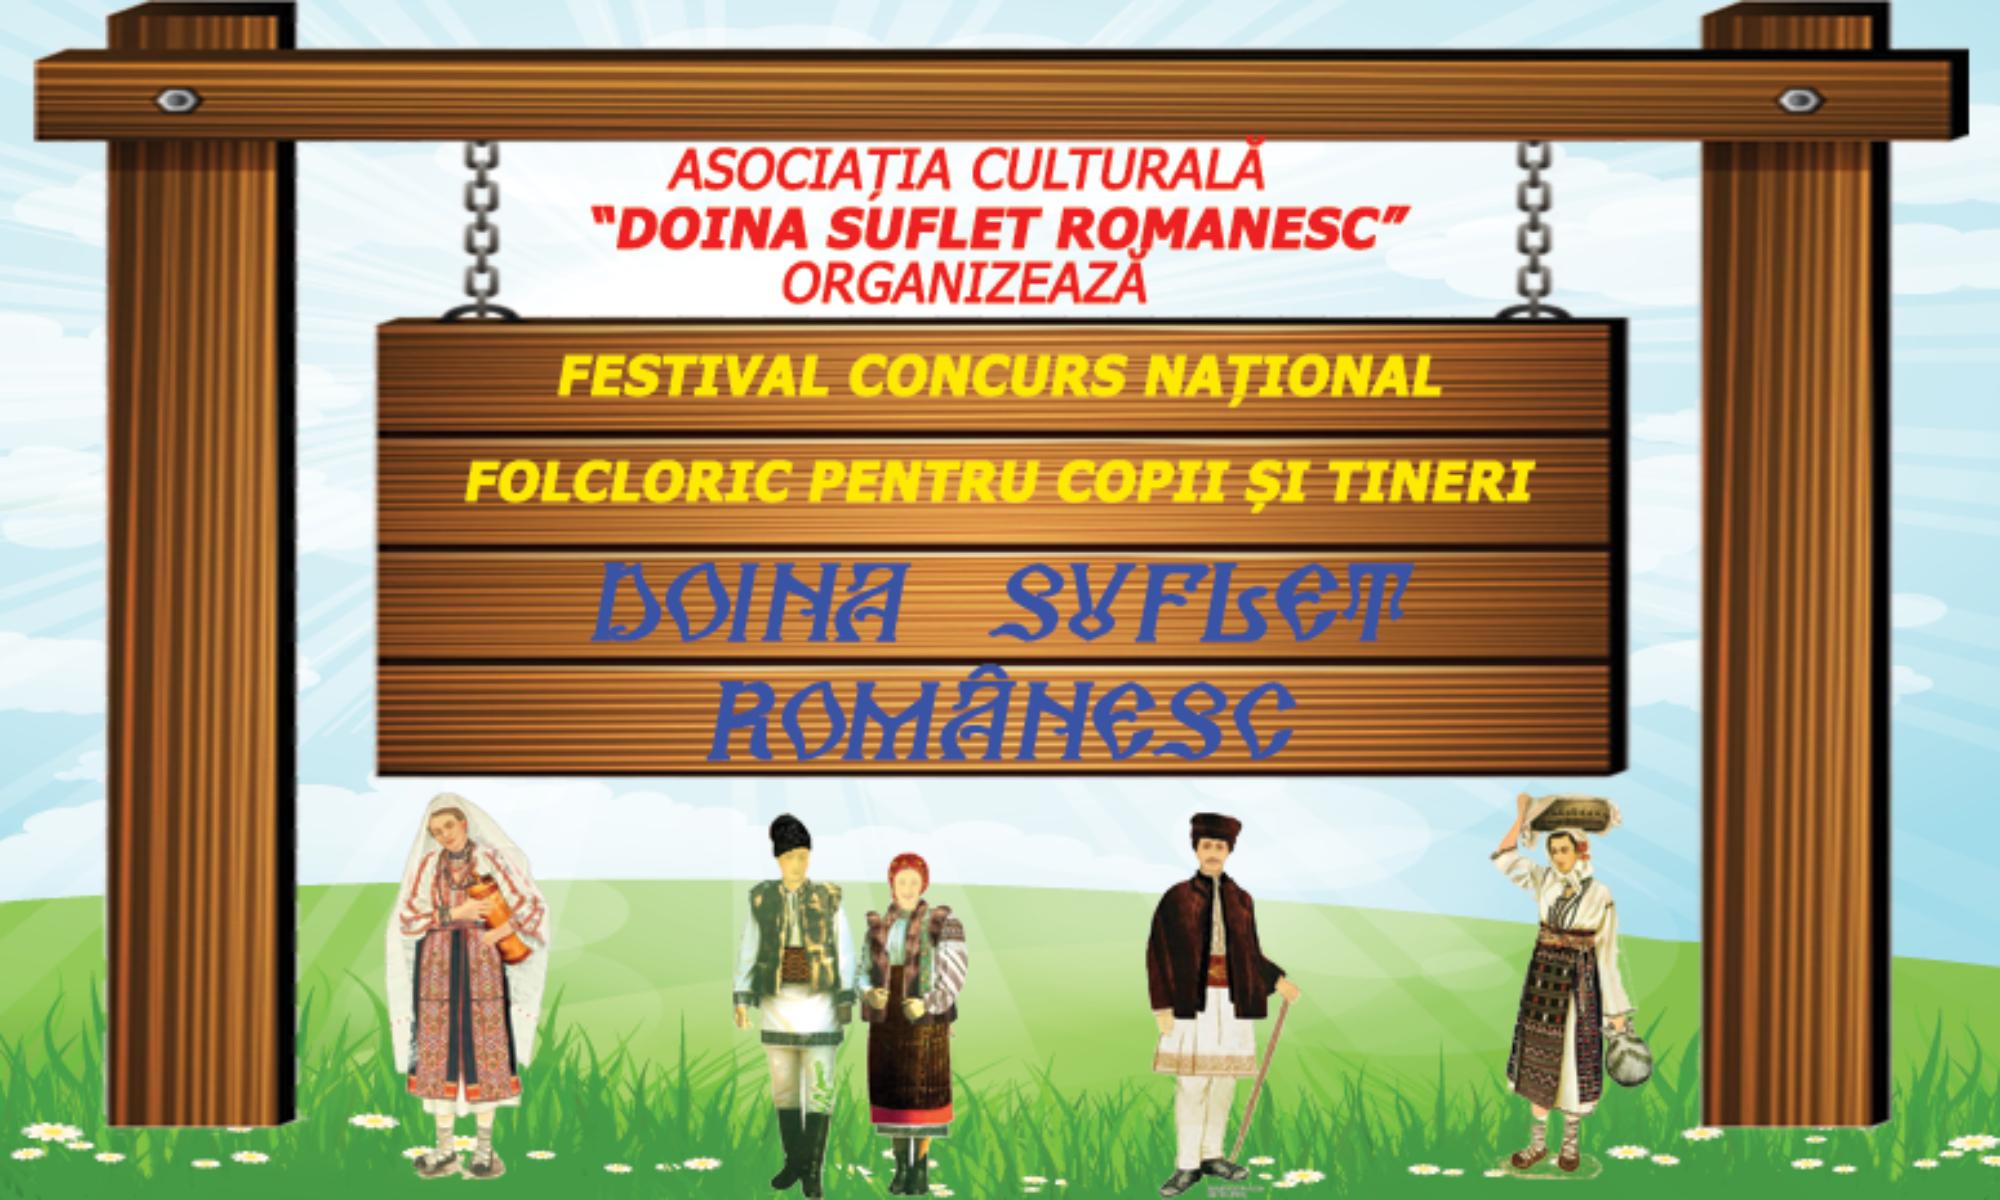 Doina Suflet Romanesc